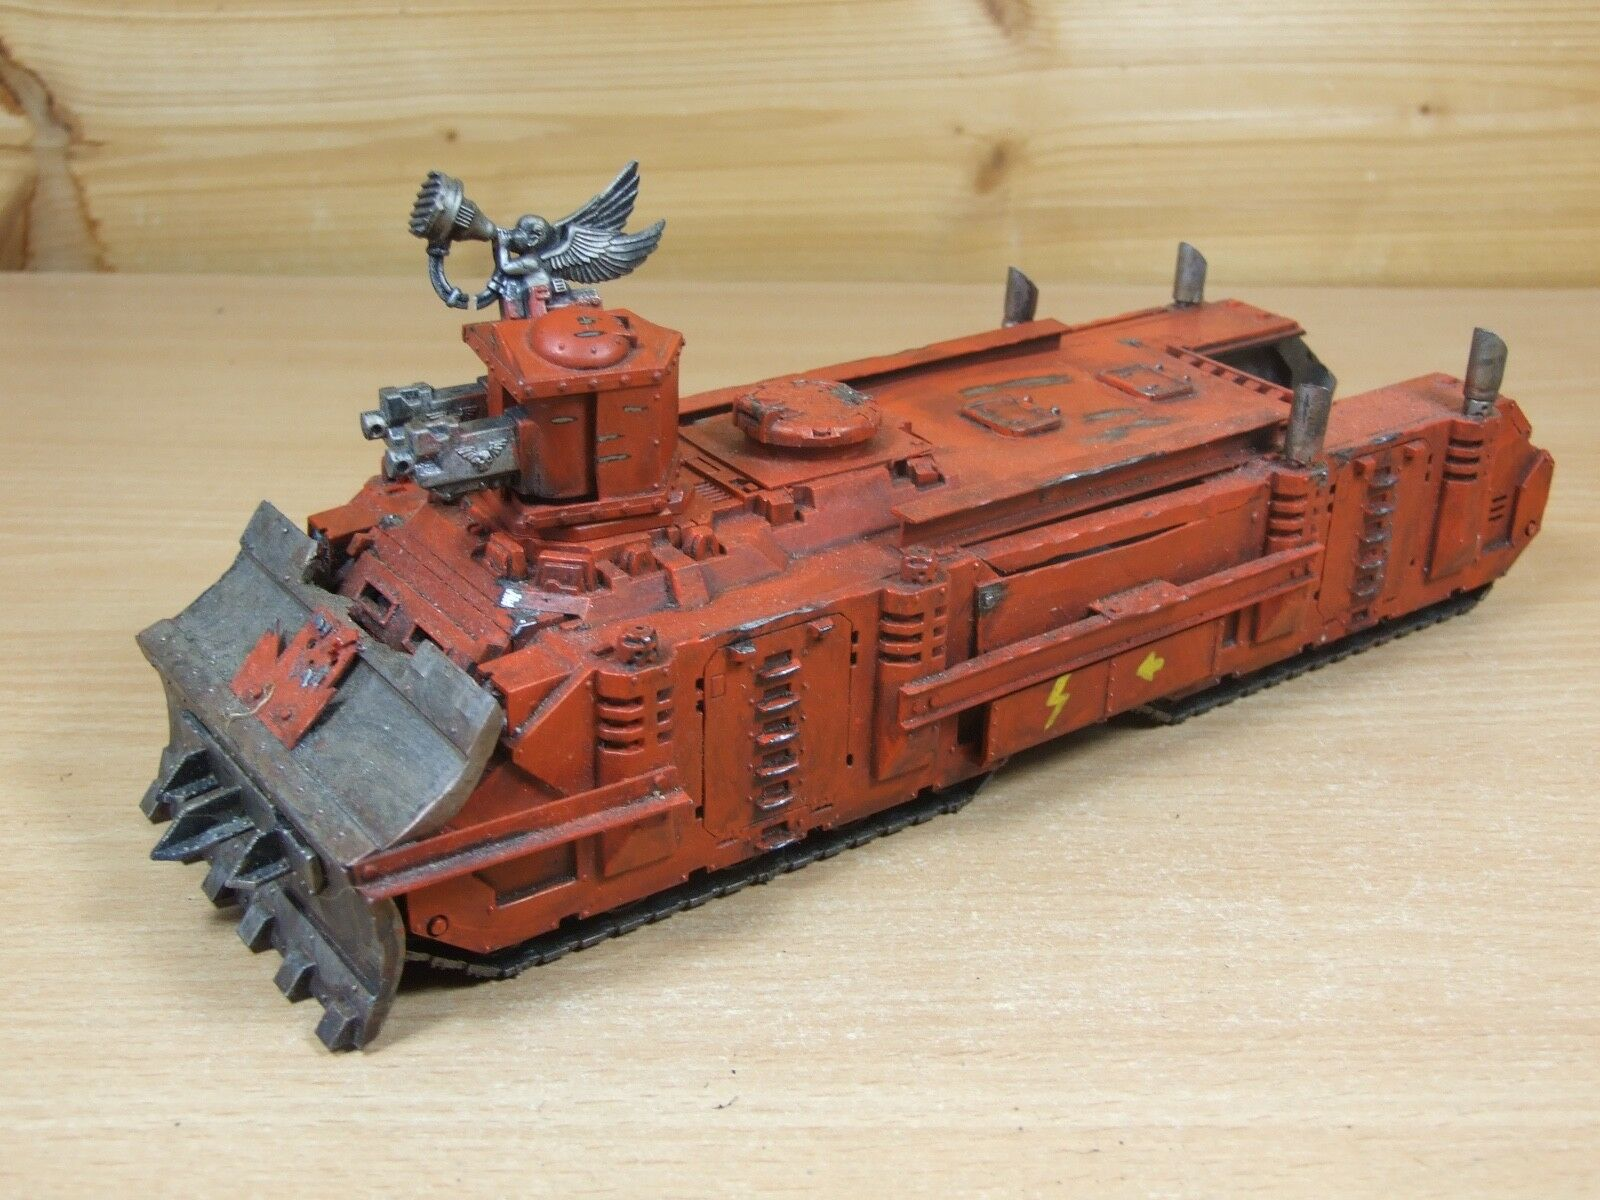 Converti custom made warhammer ork énorme trukk transport bien peint (L)